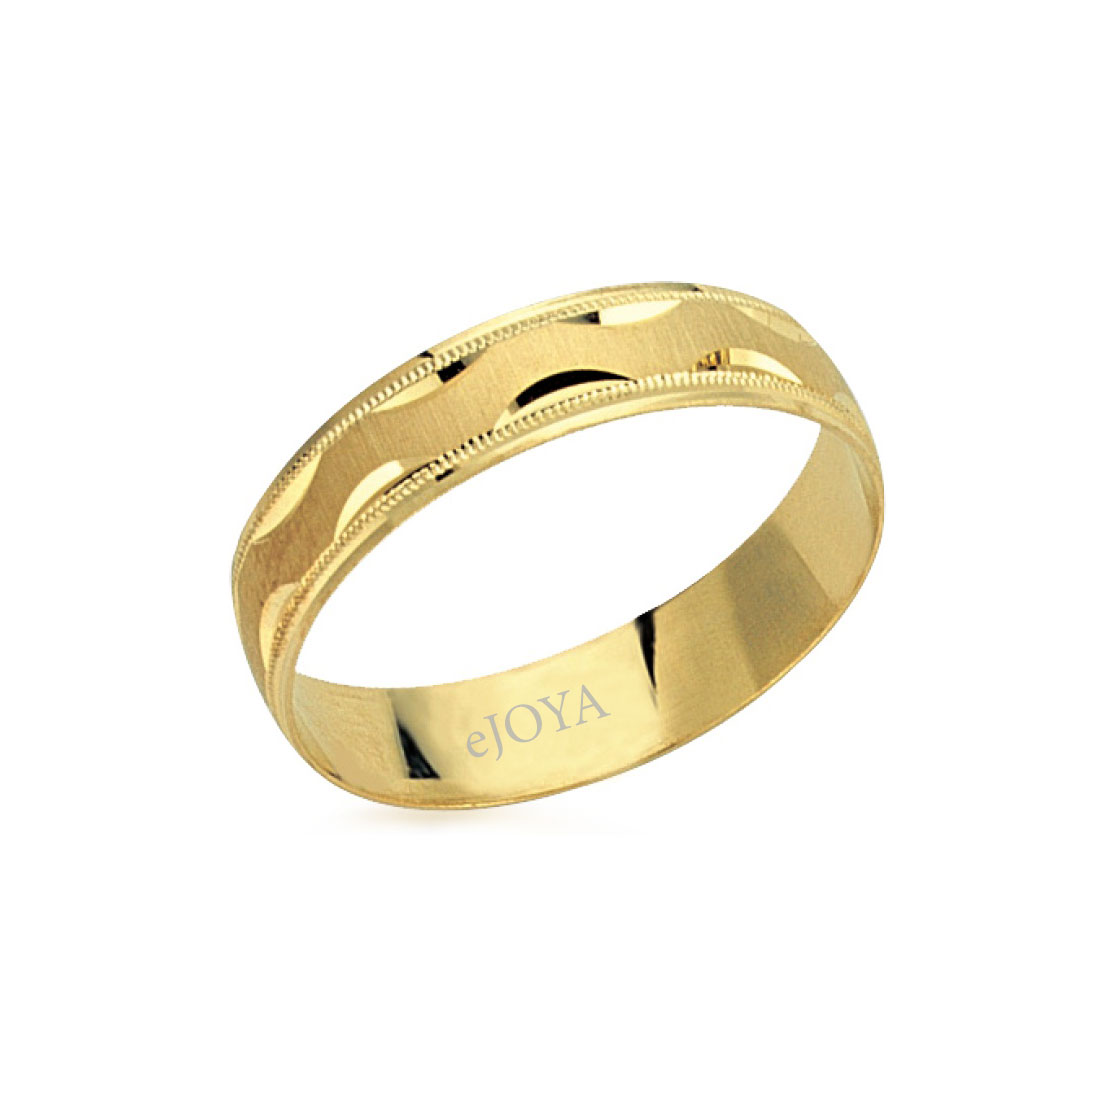 Unisex 14 Carat Gold Wedding Ring- 5 mm